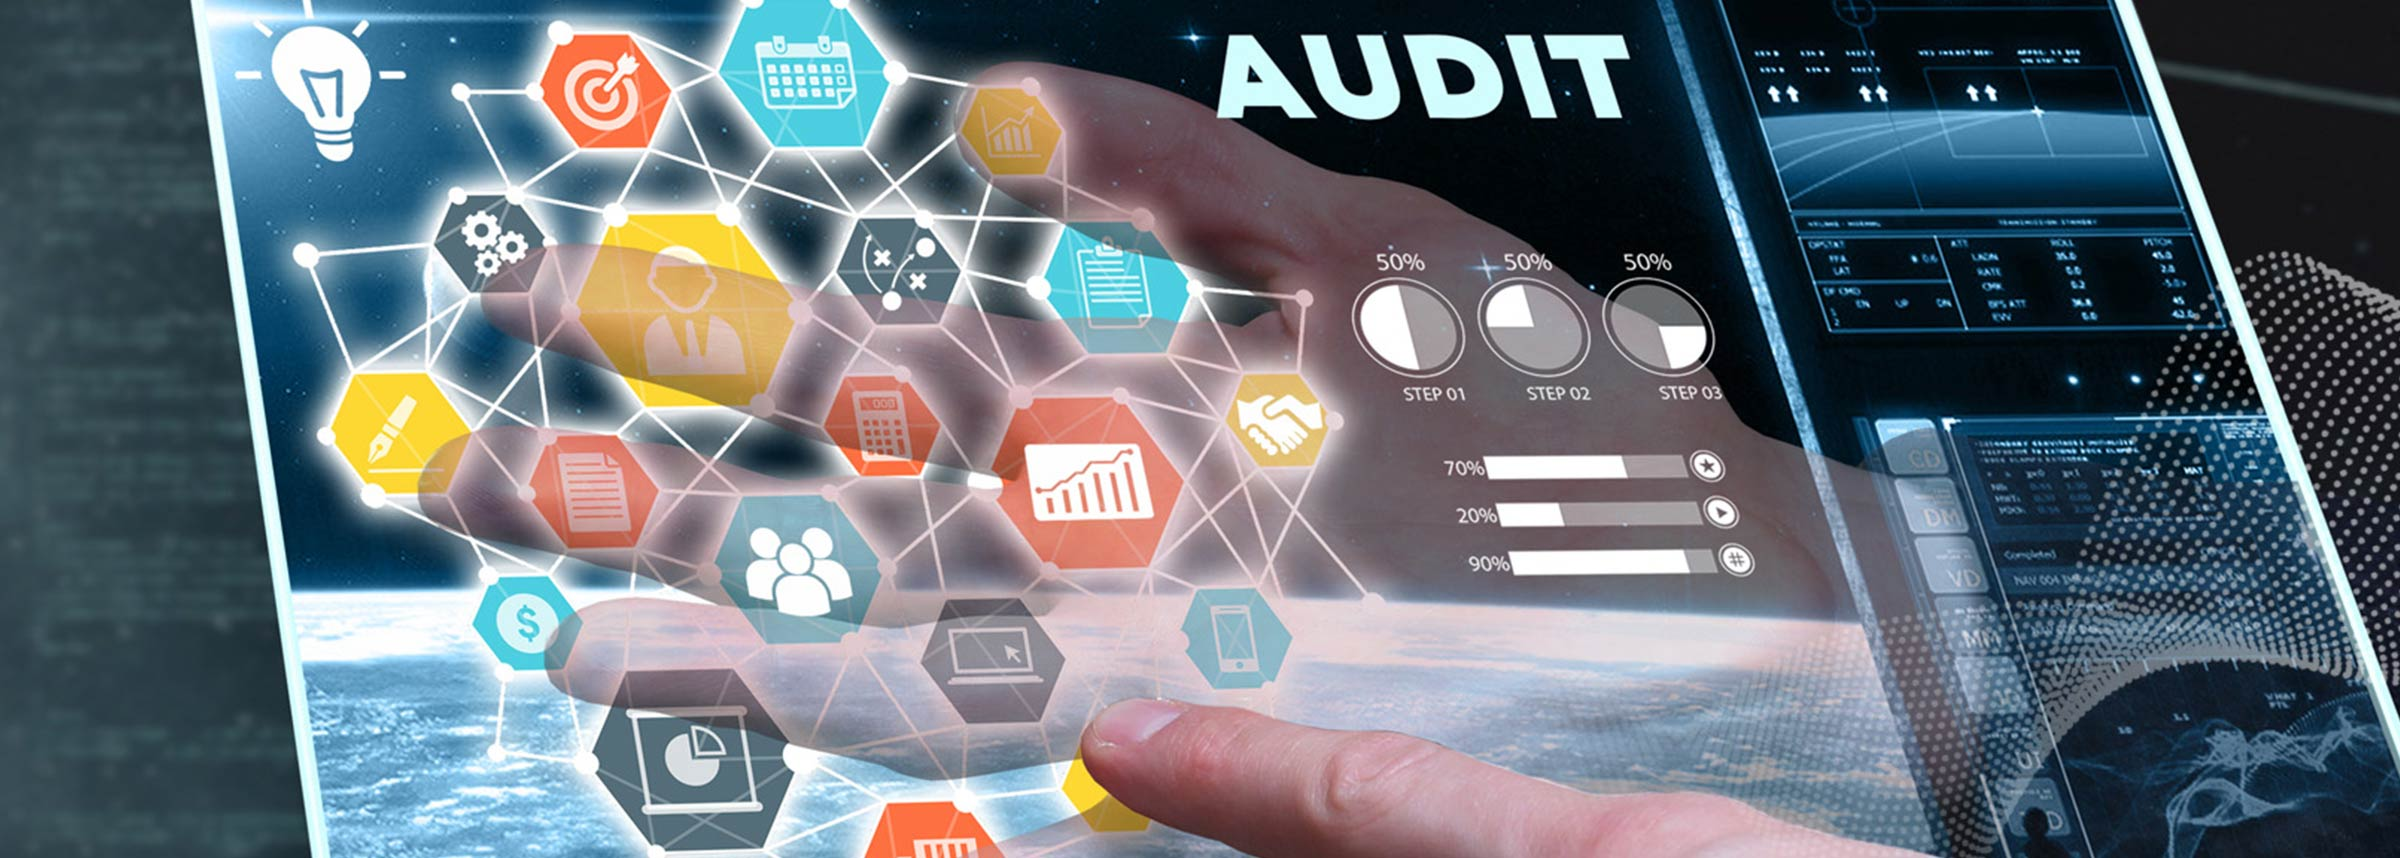 M7 Internal Audit Management App Demo